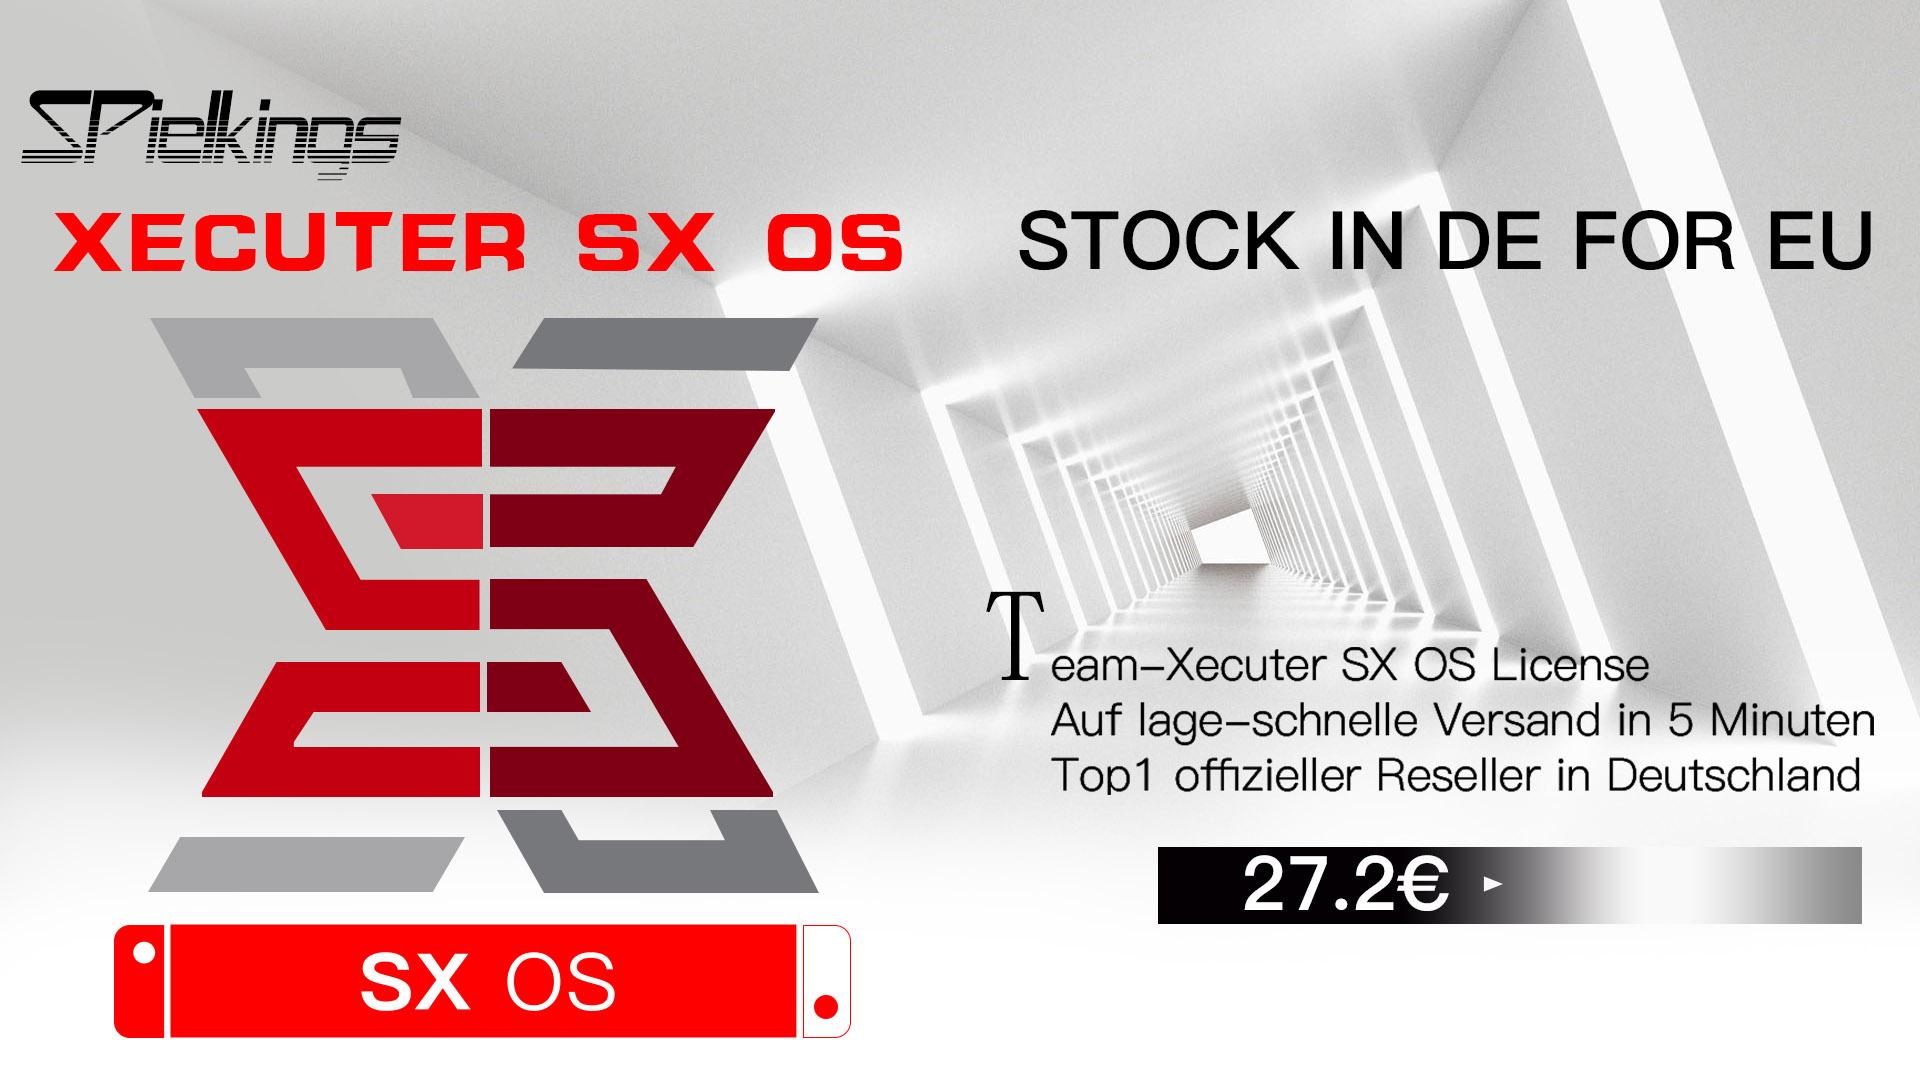 Team xecuter-sx os code license